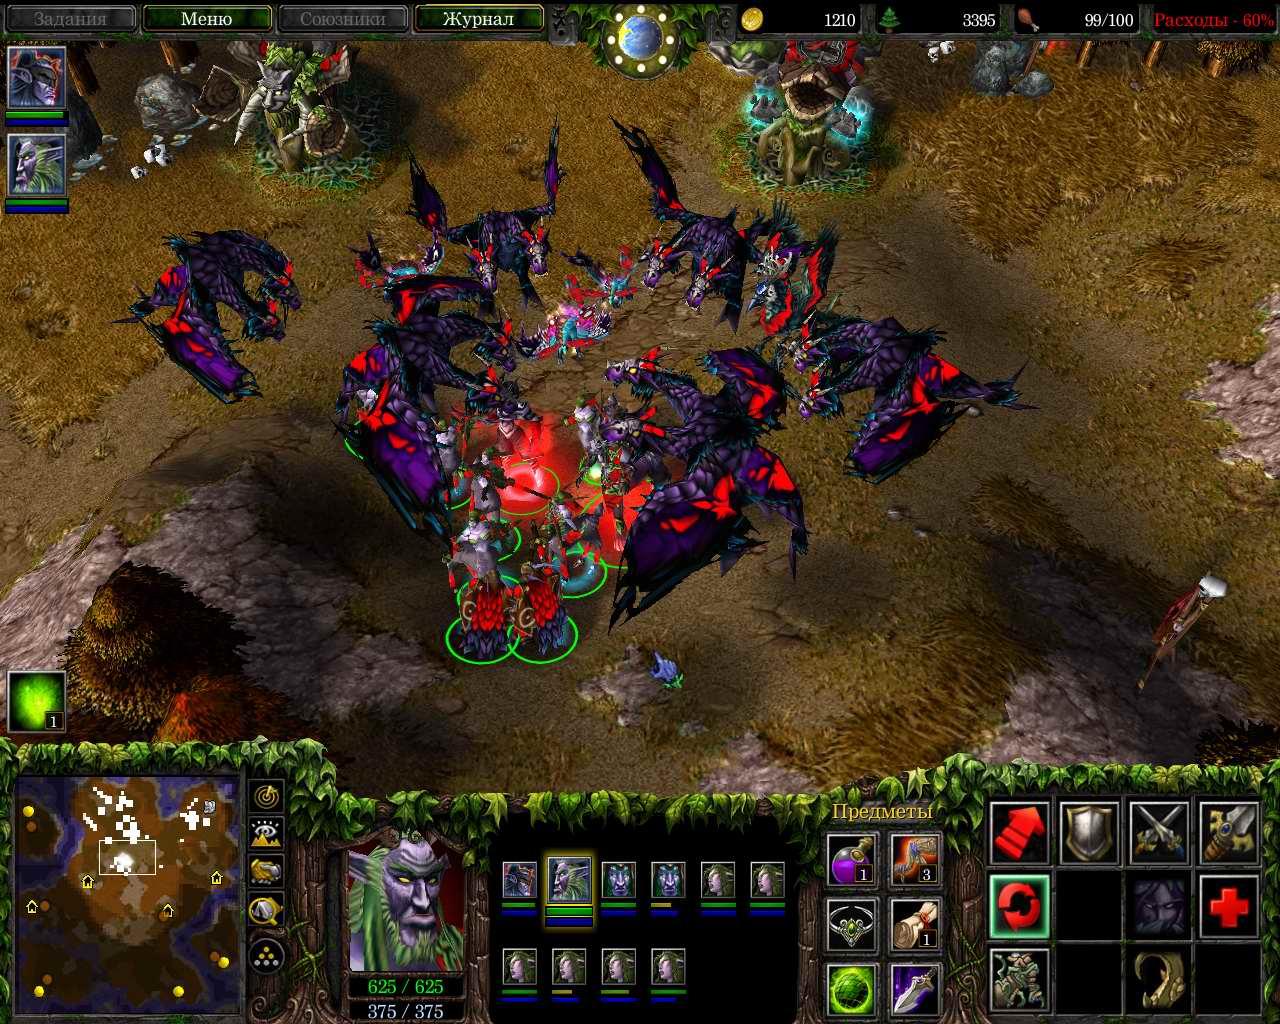 Warcraft iii frozen throne v1. 26a [repack] скачать полную.